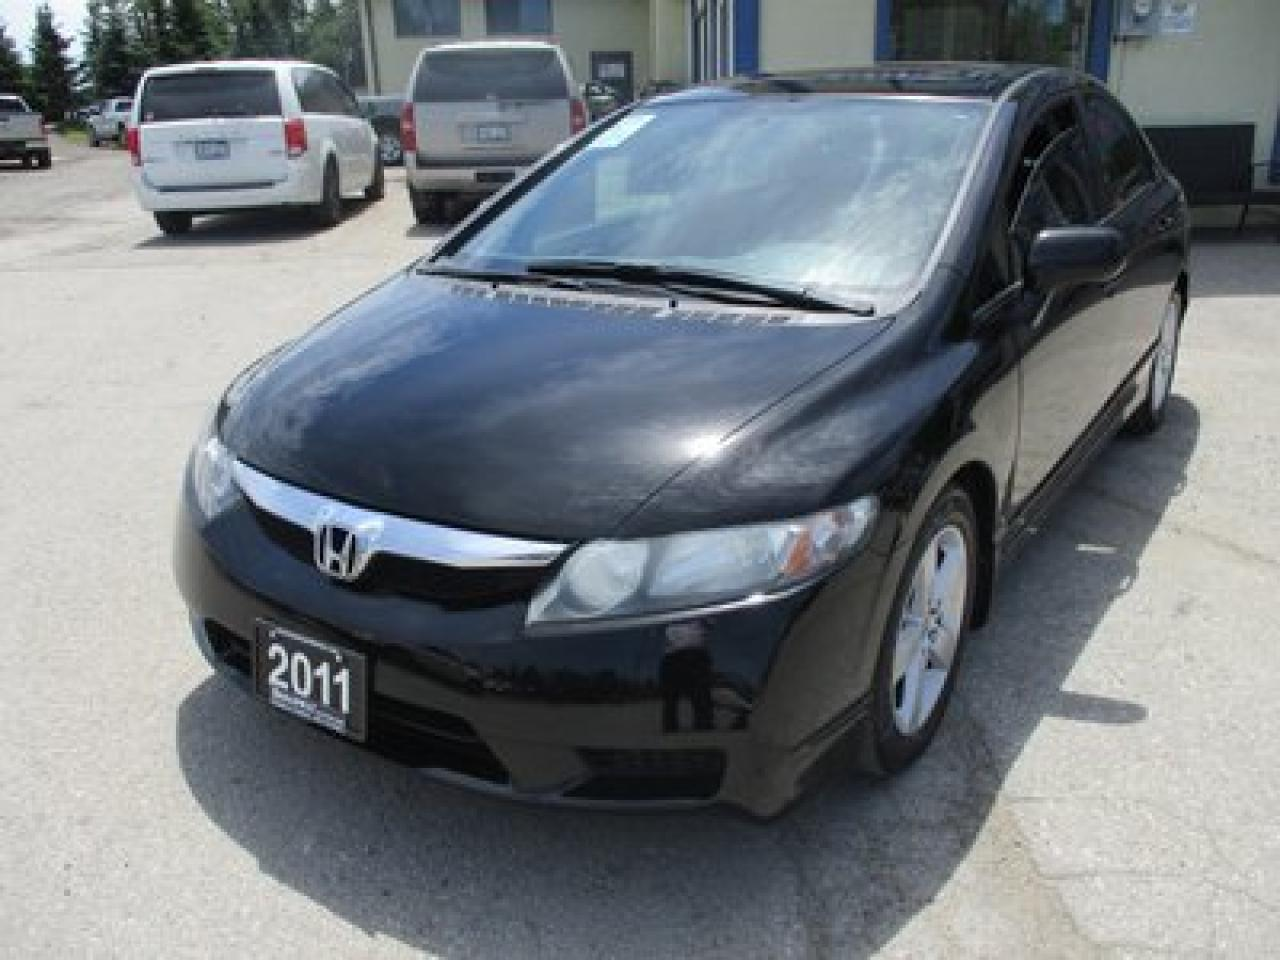 2011 Honda Civic POWER EQUIPPED LX MODEL 5 PASSENGER 1.8L - SOHC.. CD/AUX INPUT.. KEYLESS ENTRY.. POWER SUNROOF..